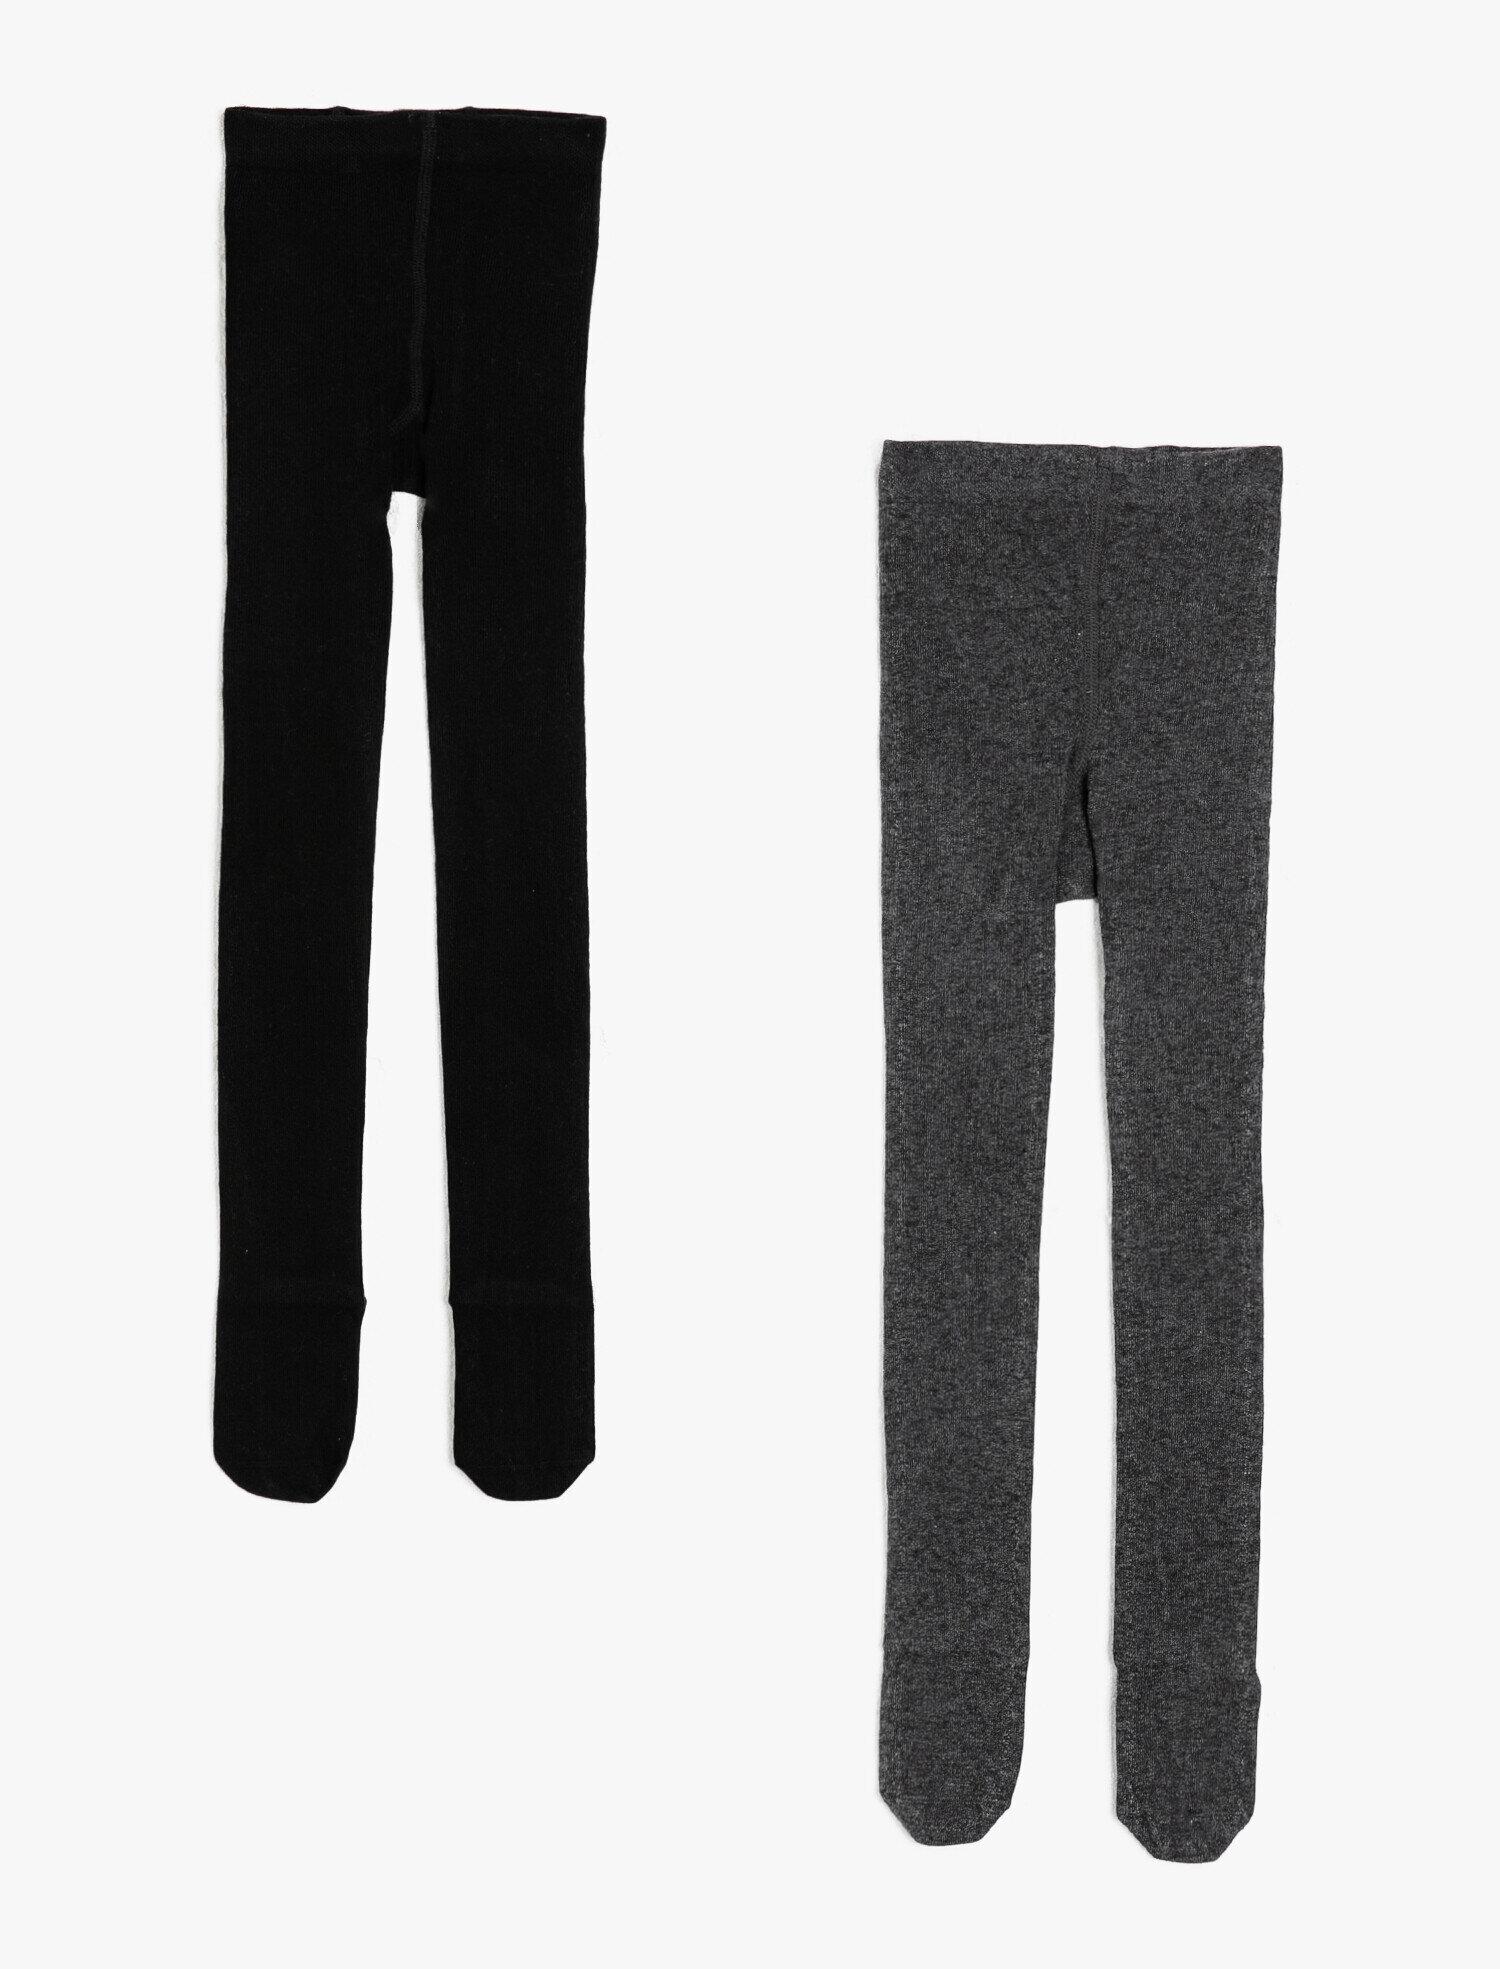 2'li Külotlu Çorap